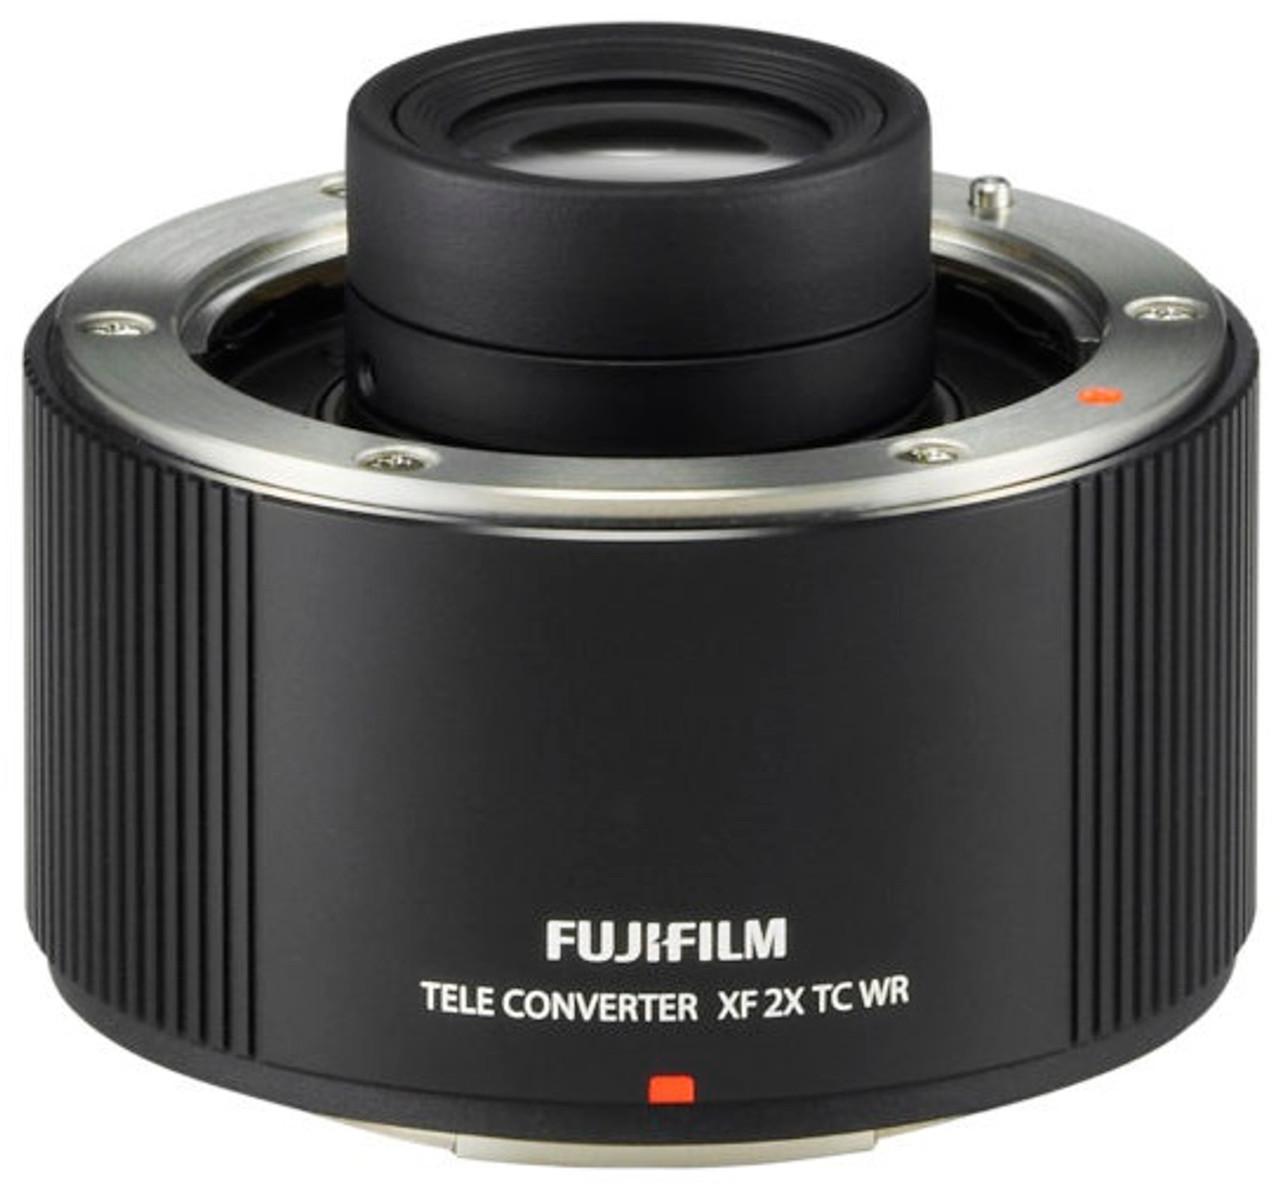 Fujifilm FUJINON Teleconverter XF 2X TC WR